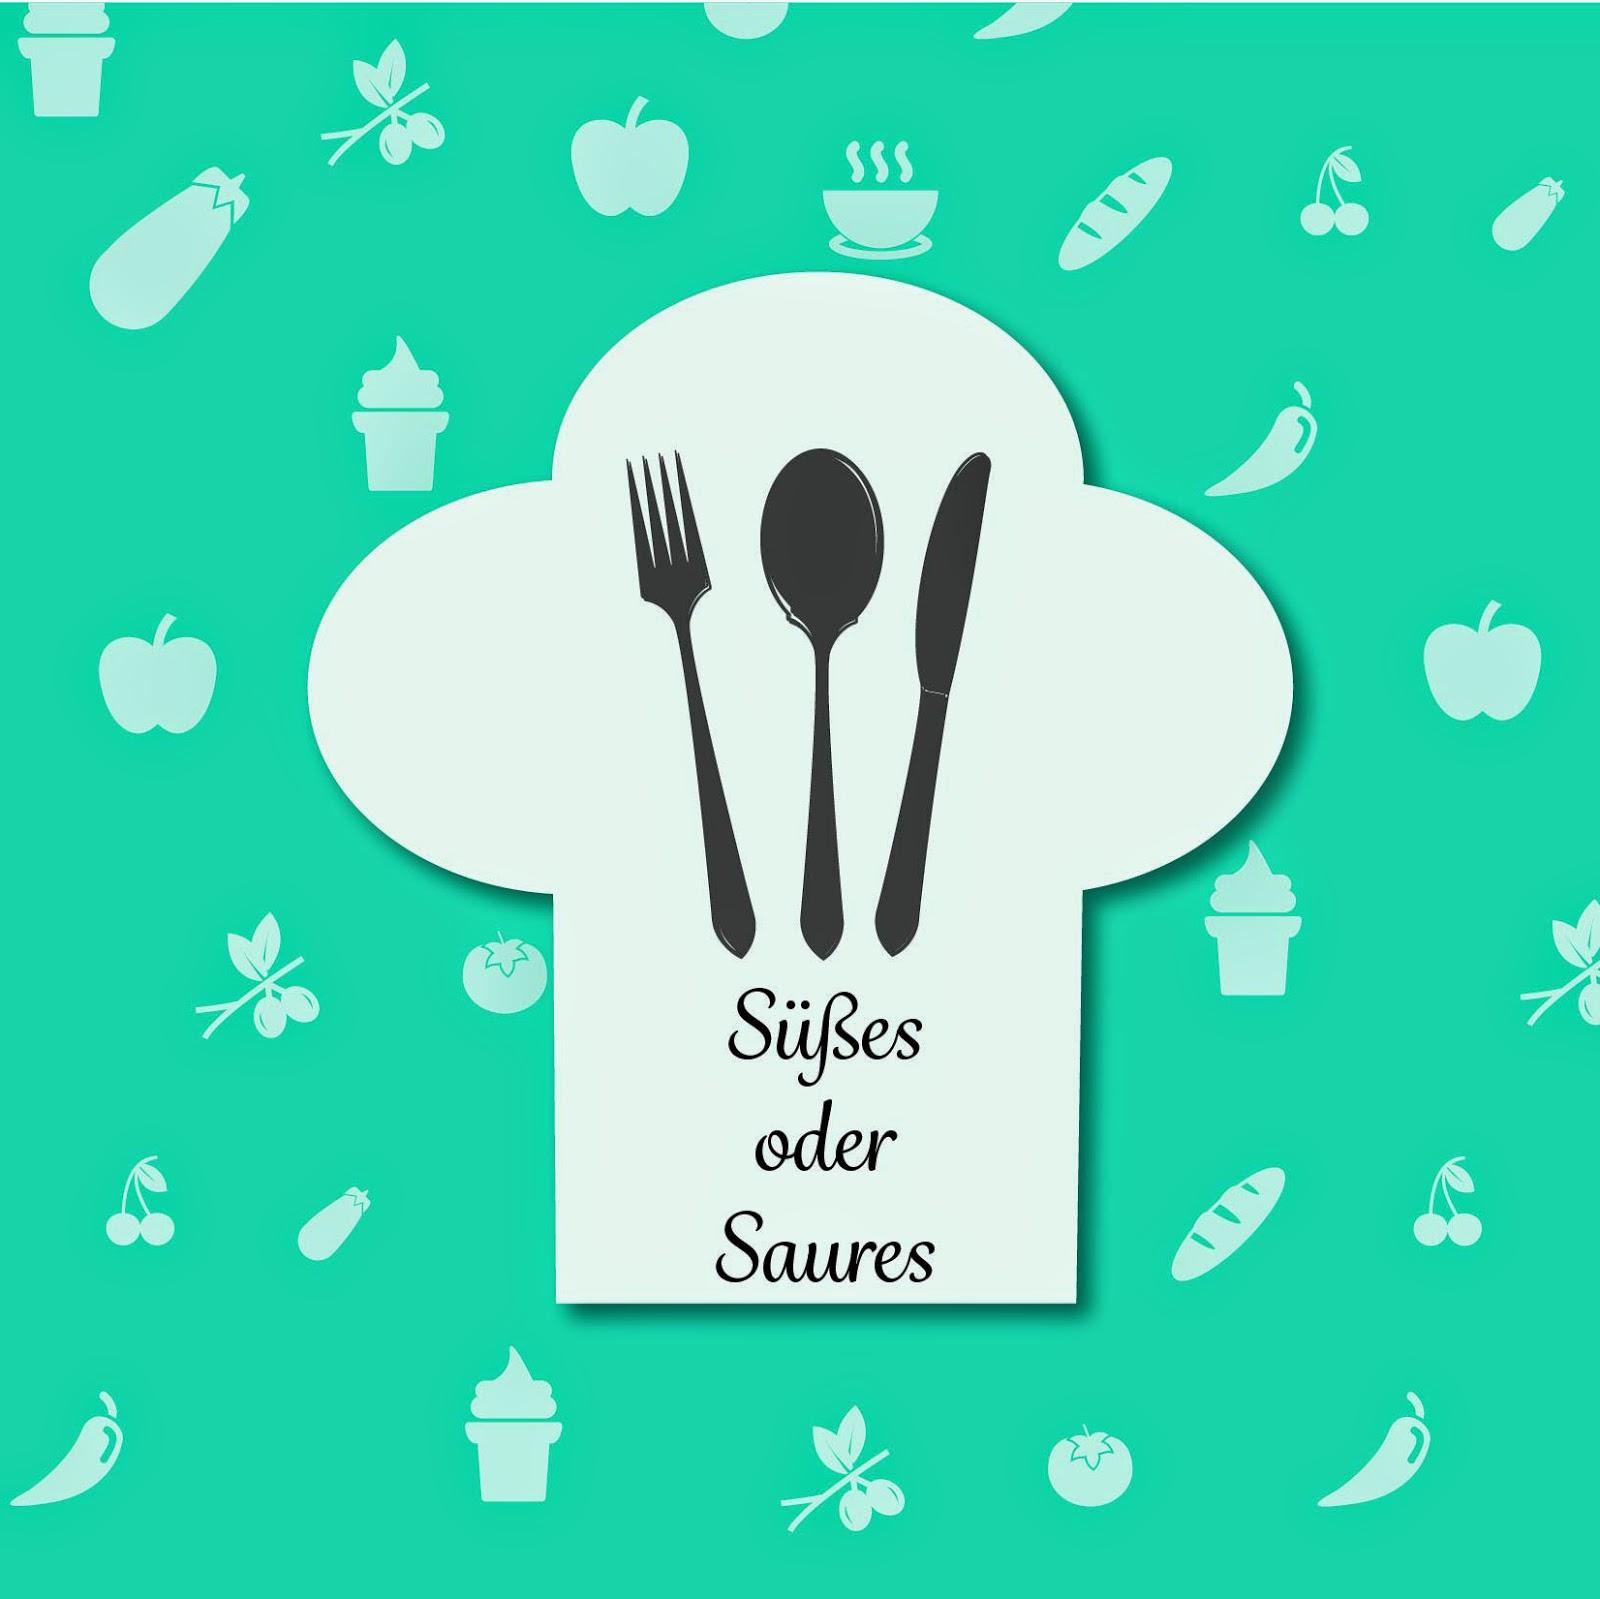 "<a href=""http://de.freepik.com/vektoren-kostenlos/restaurant-vektor-poster-design_712304.htm"">Entworfen durch Freepik</a>"